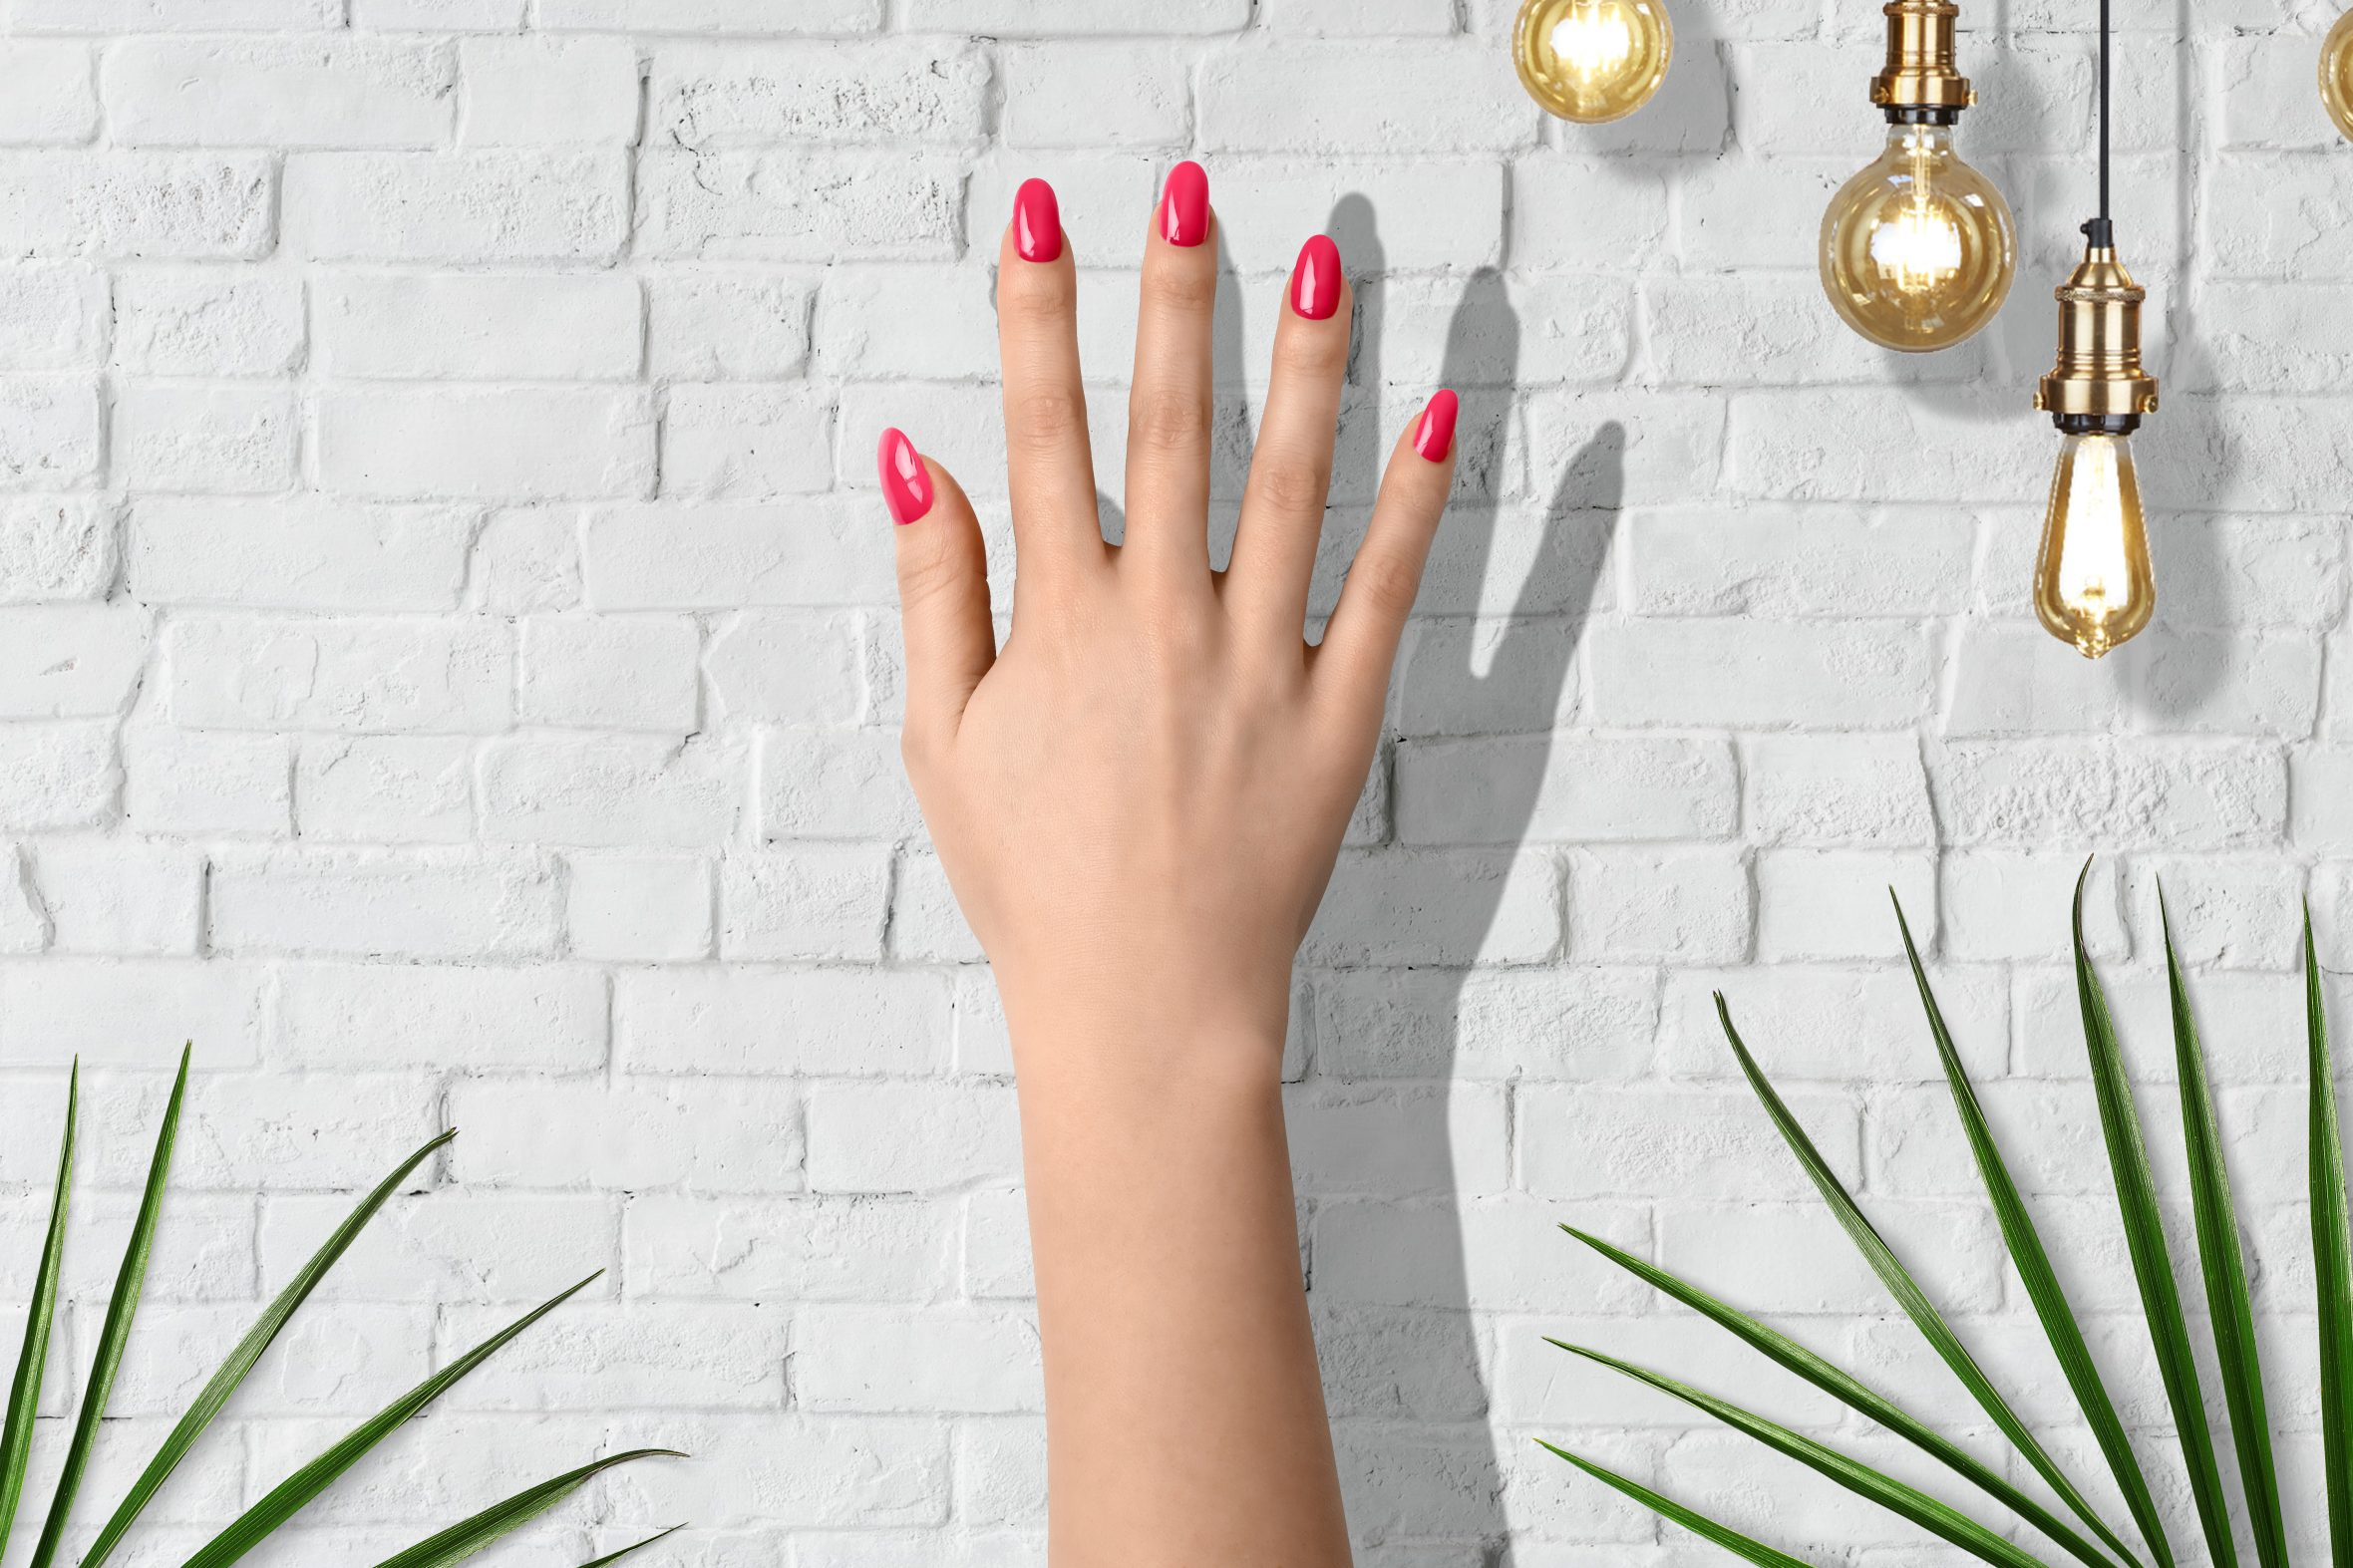 Fel roze nagellak voor je manicure